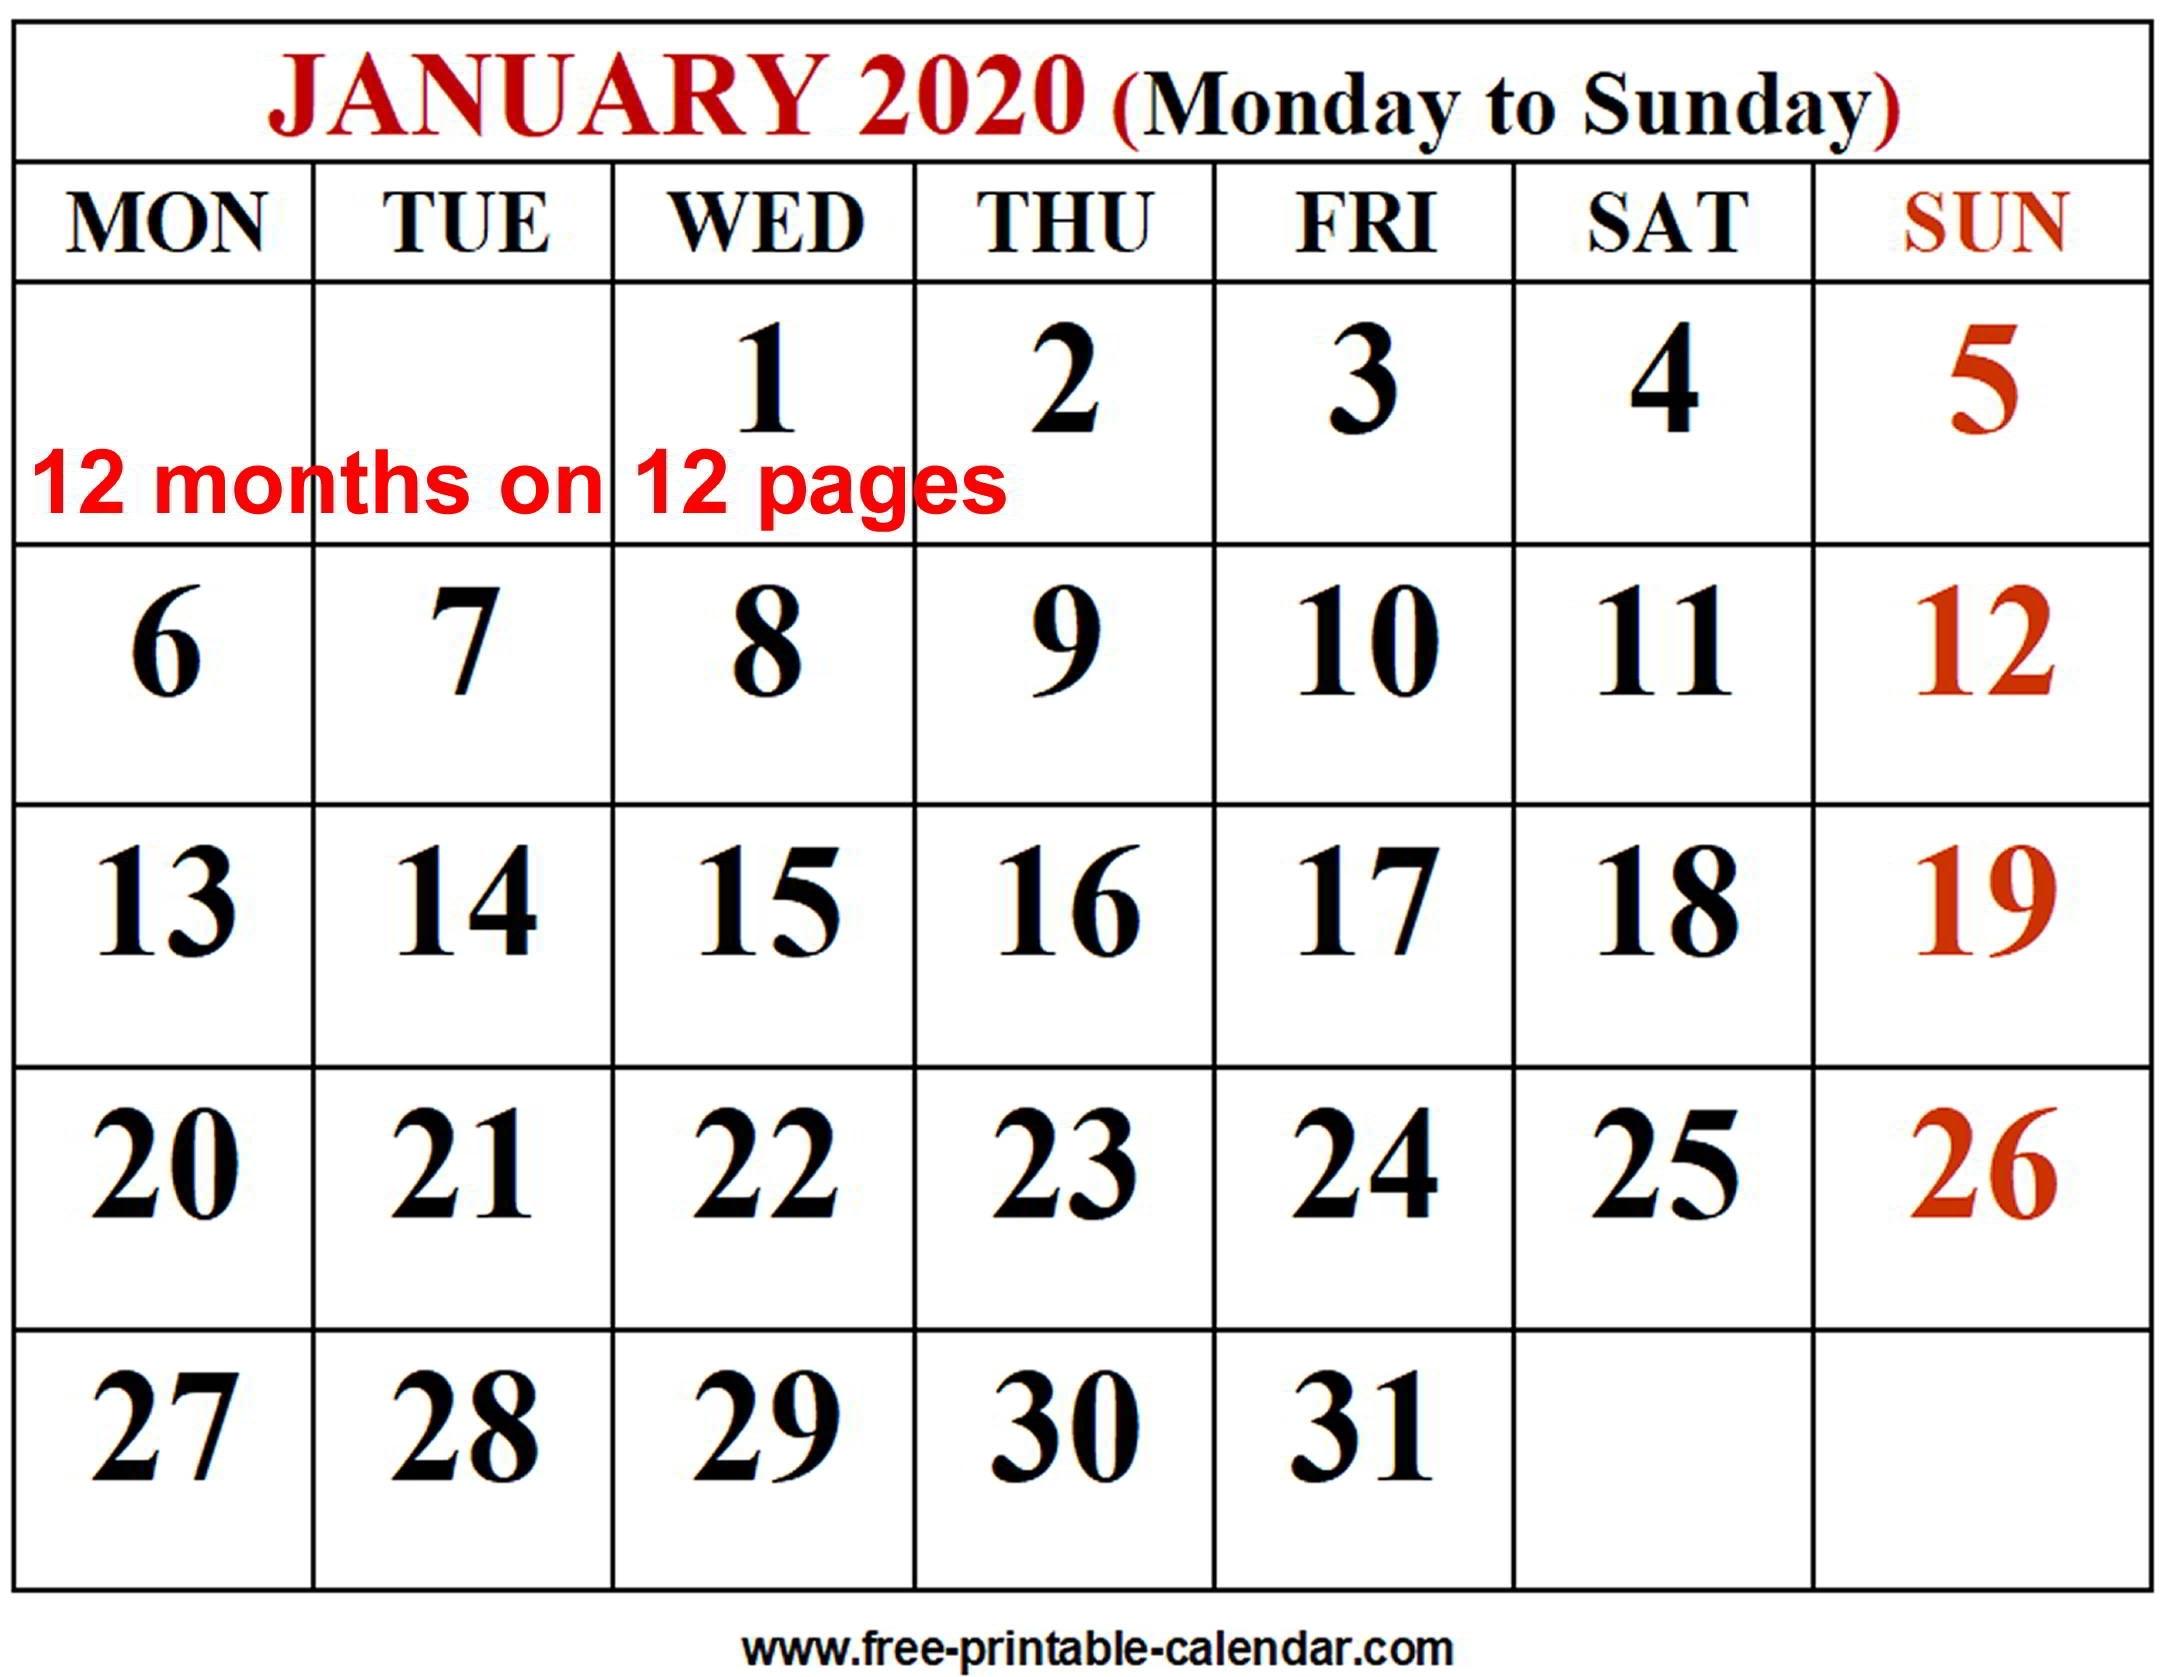 2020 Calendar Template - Free-Printable-Calendar for 2020 Calendar Printable Monday Sunday